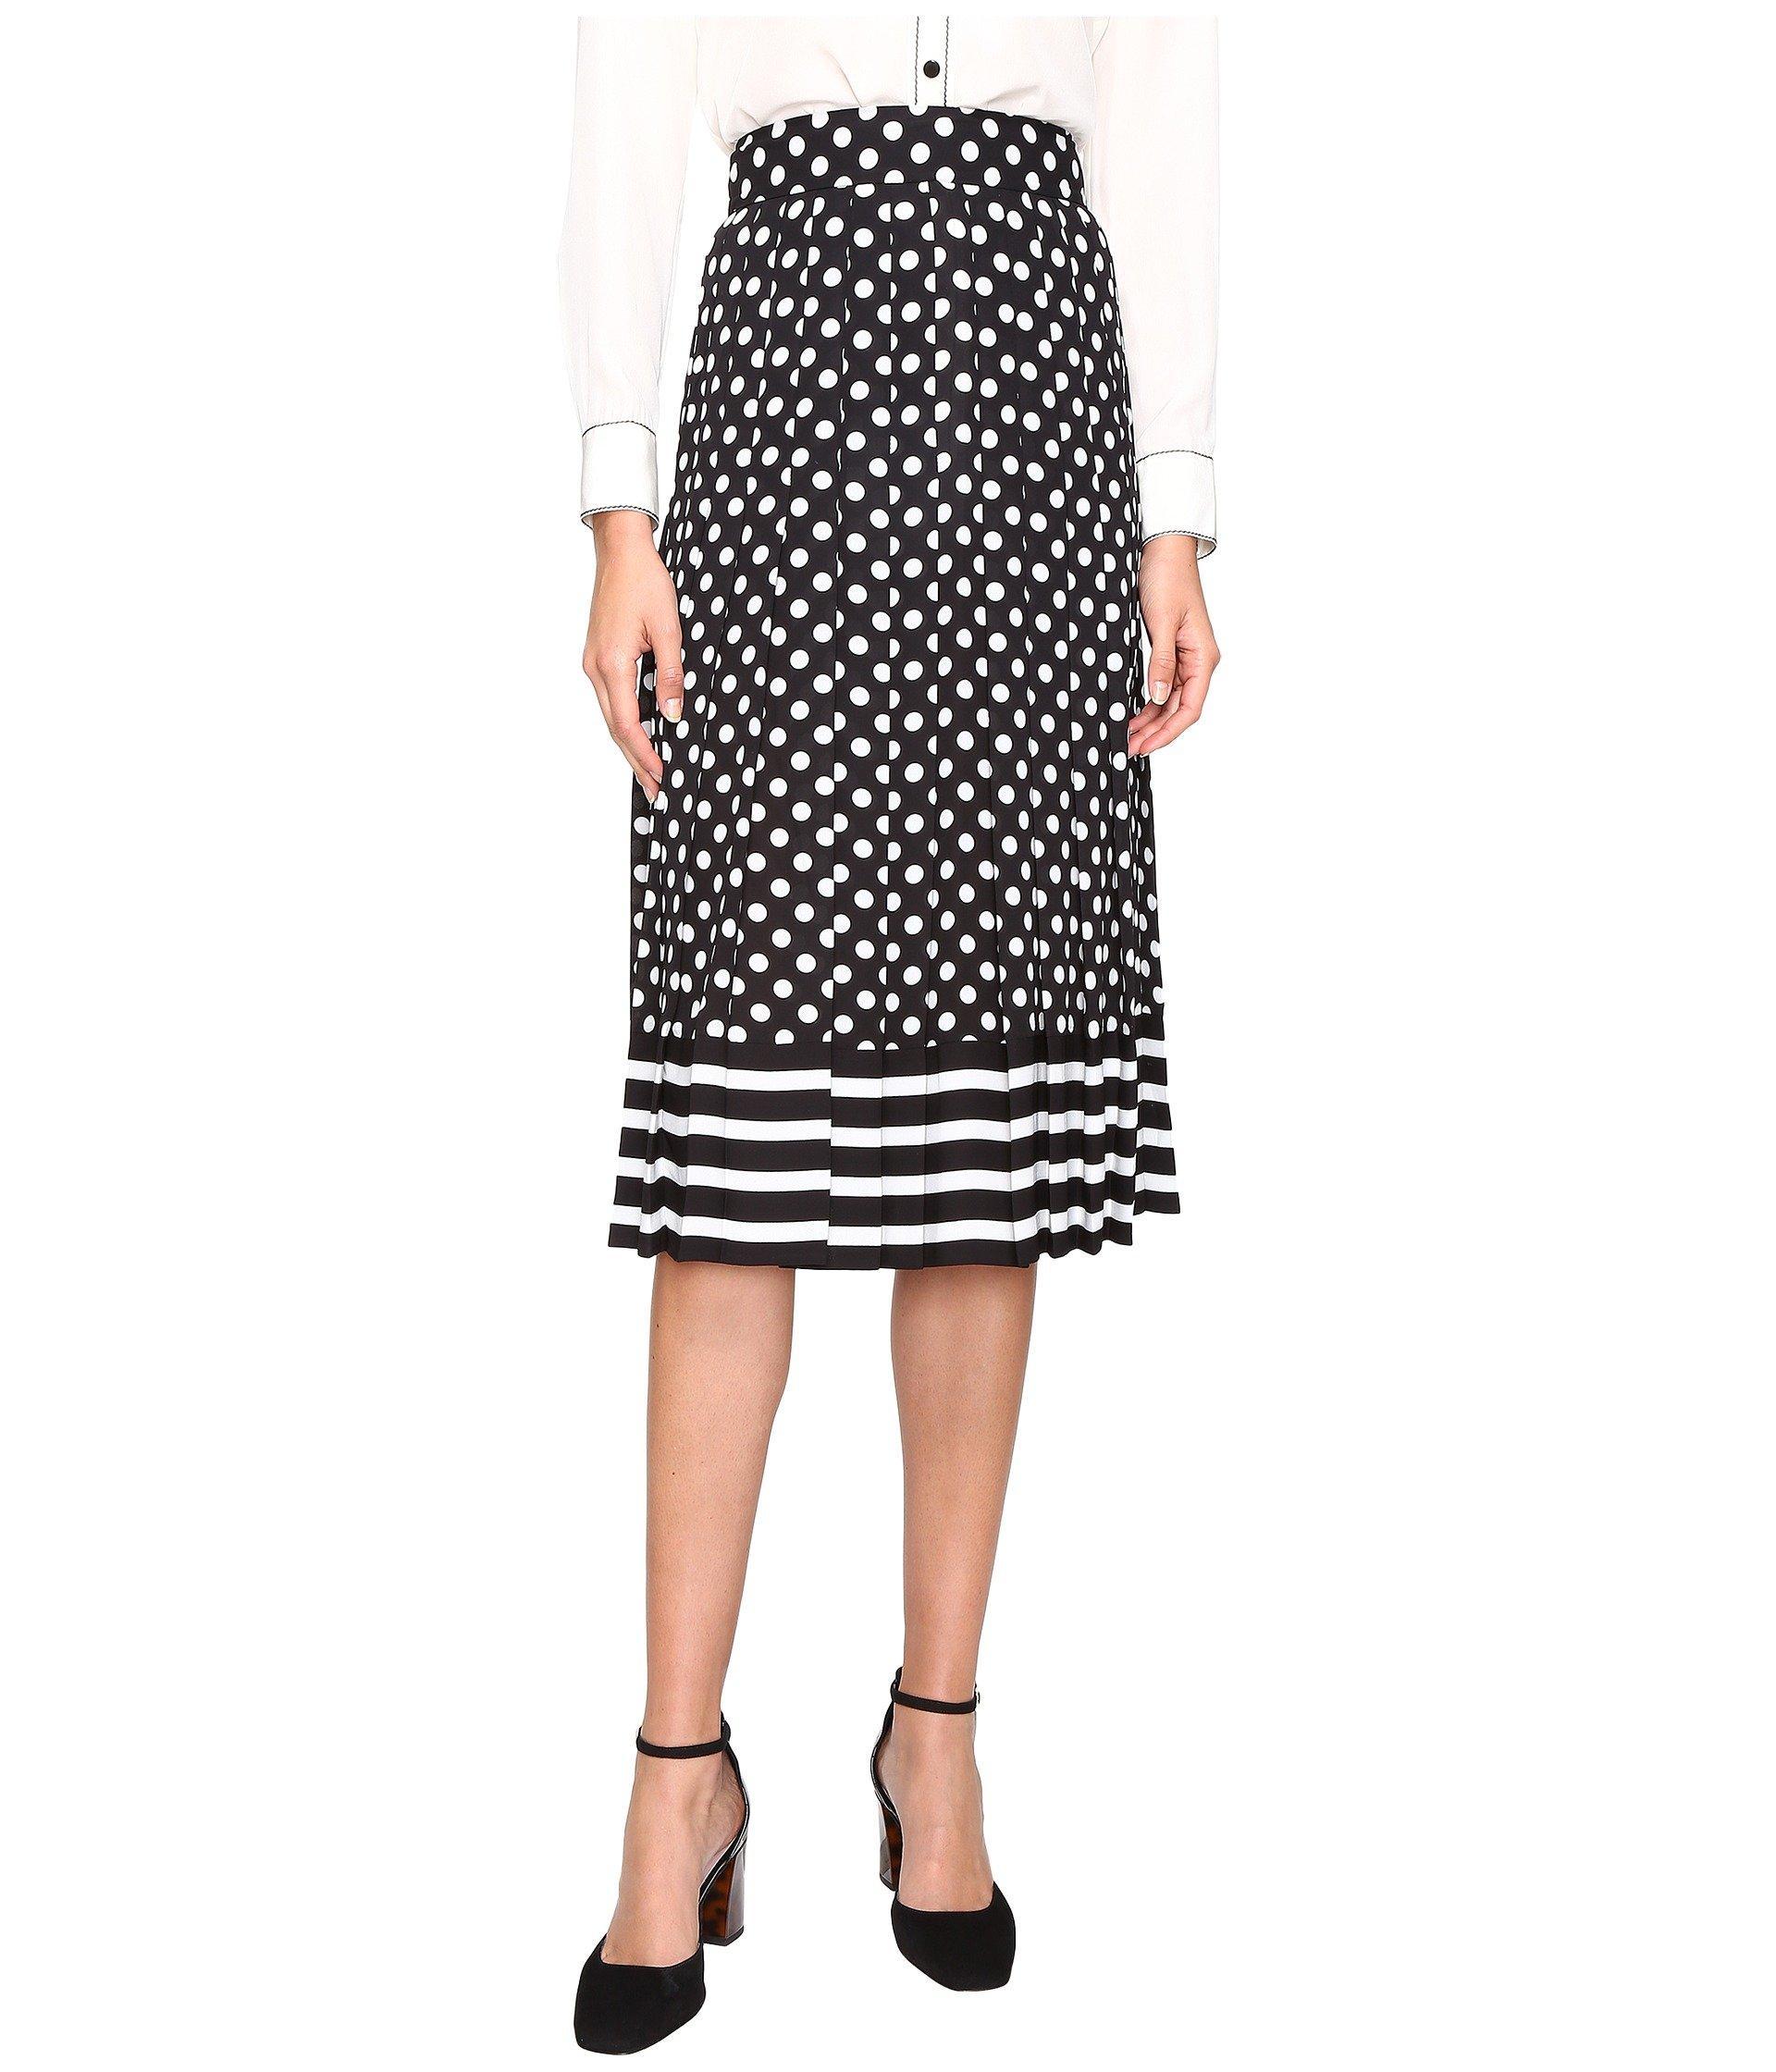 db1df5a6c9db Kate Spade Dot Stripe Pleated Skirt In Black/Cream | ModeSens